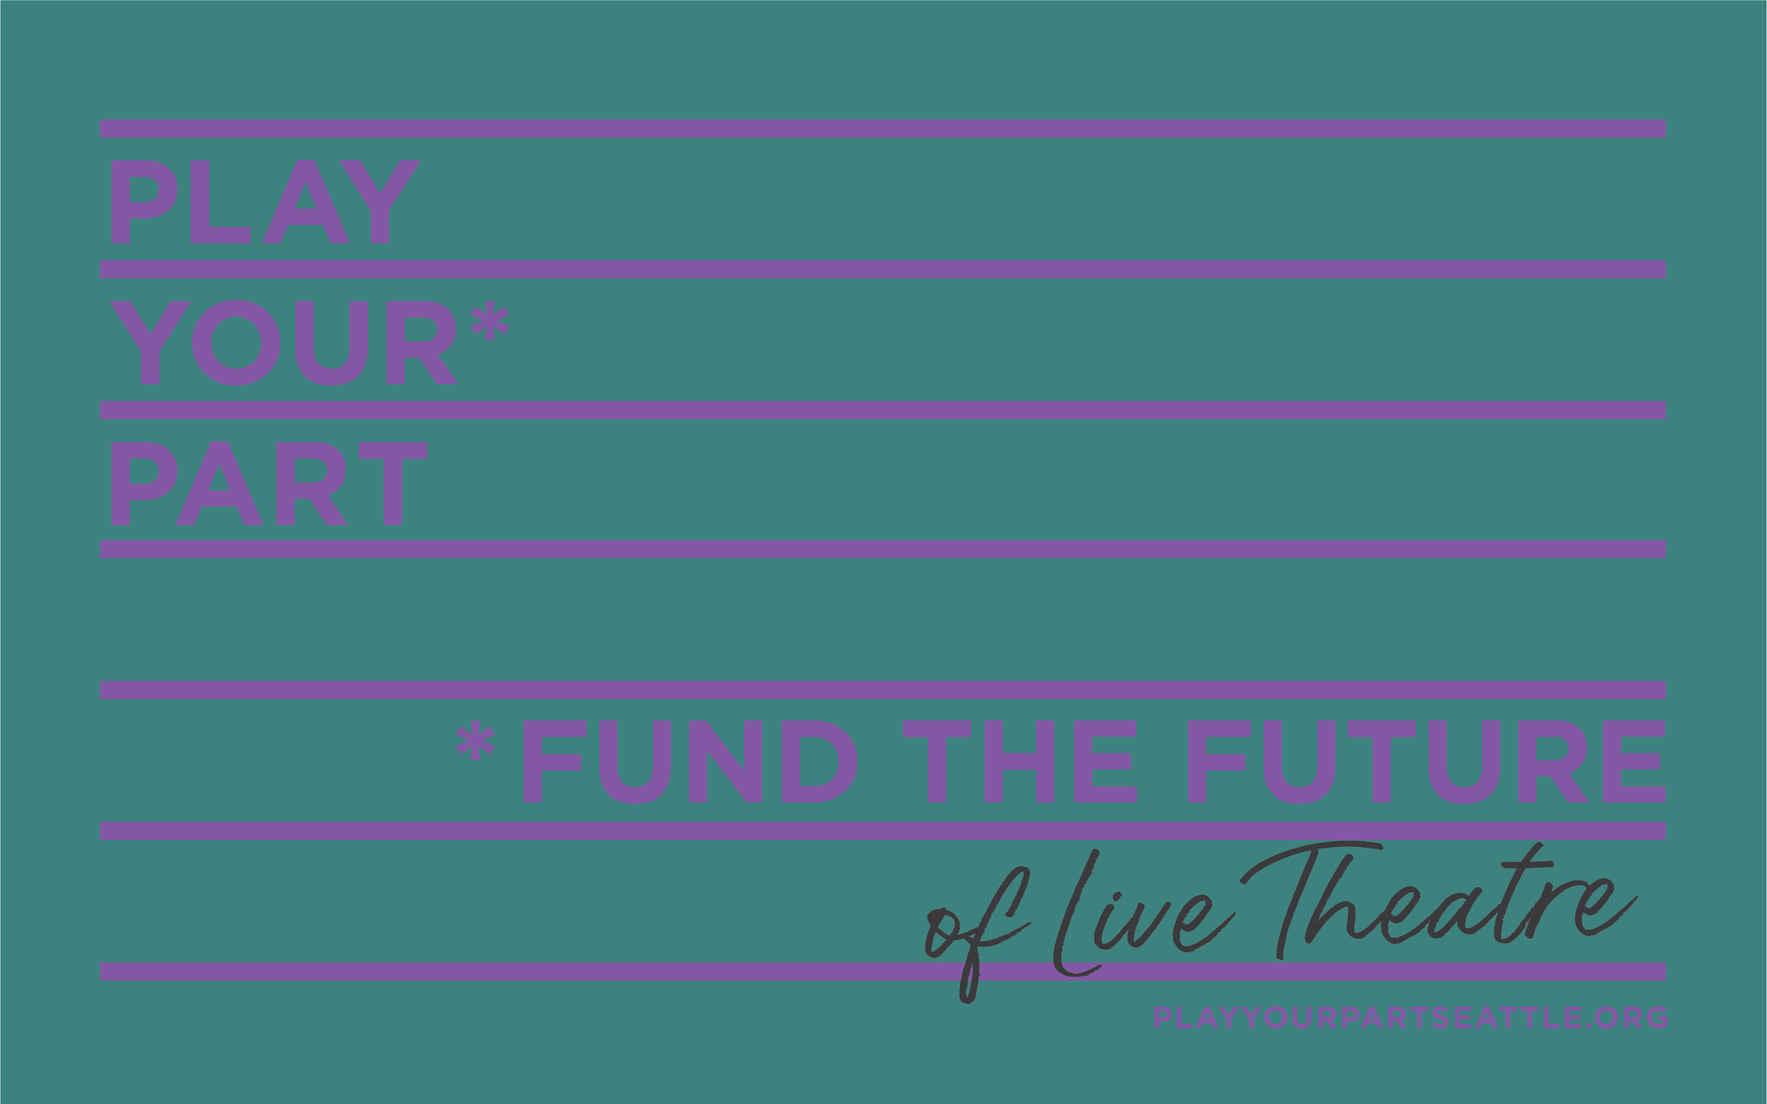 Fund the Future of LIVE theatre! image